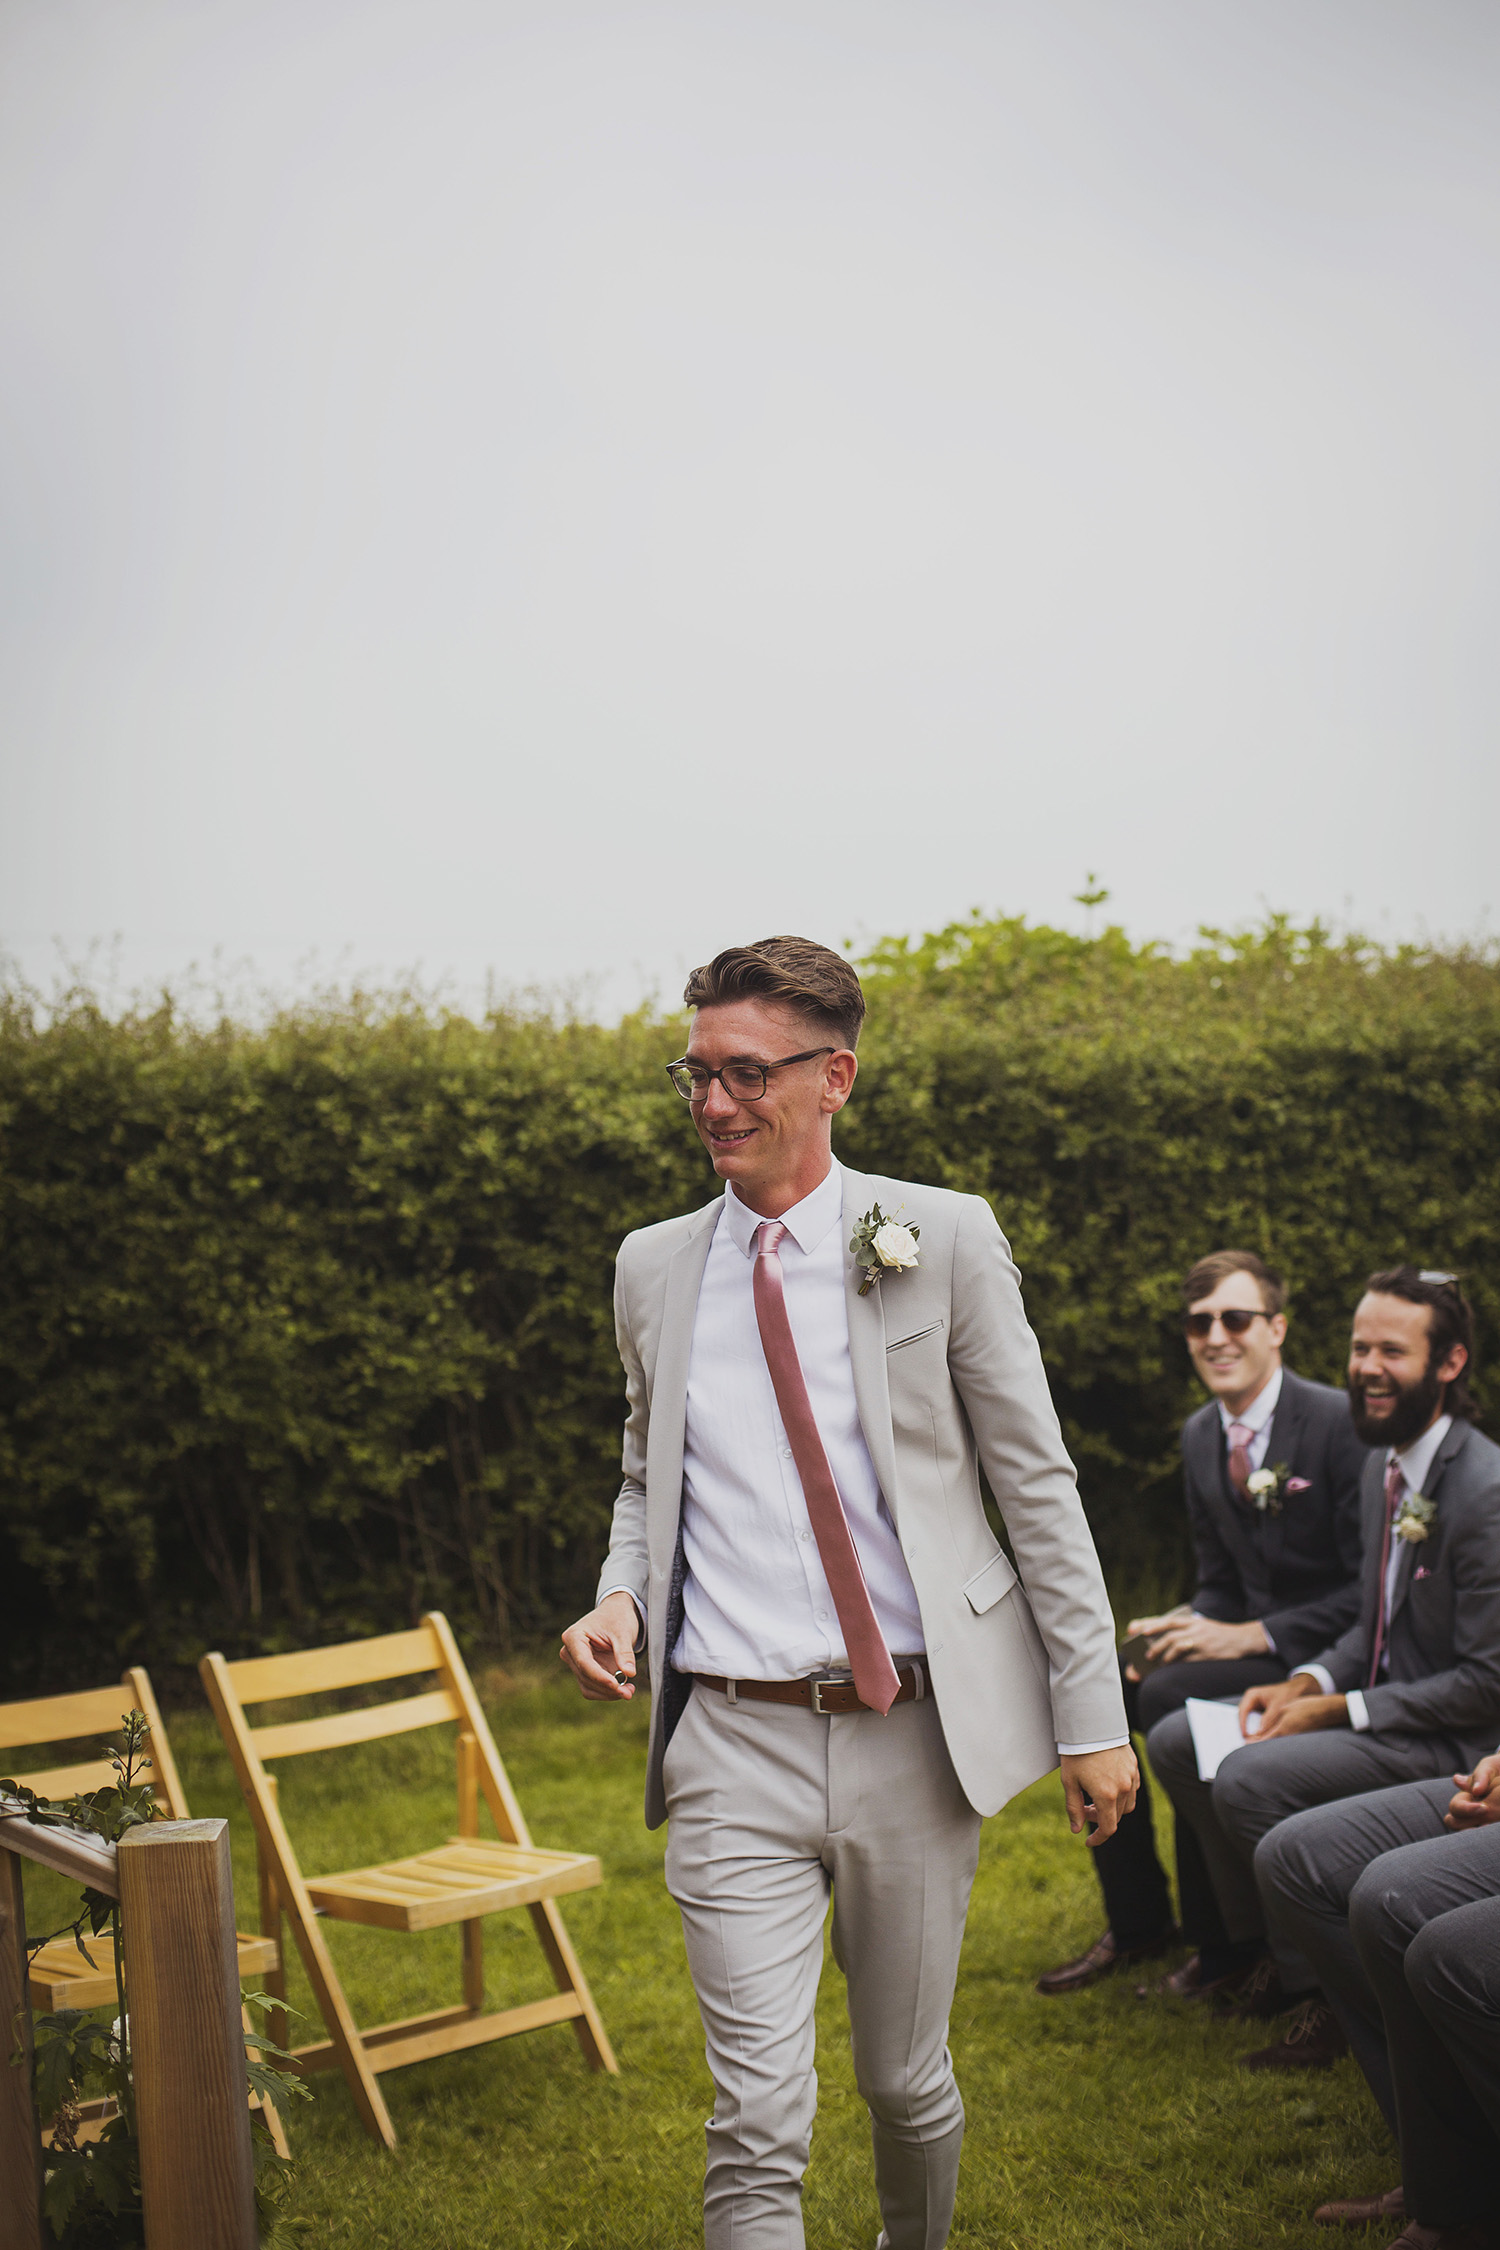 best man bringing rings at wedding ceremony at cott farm barn wedding venue somerset